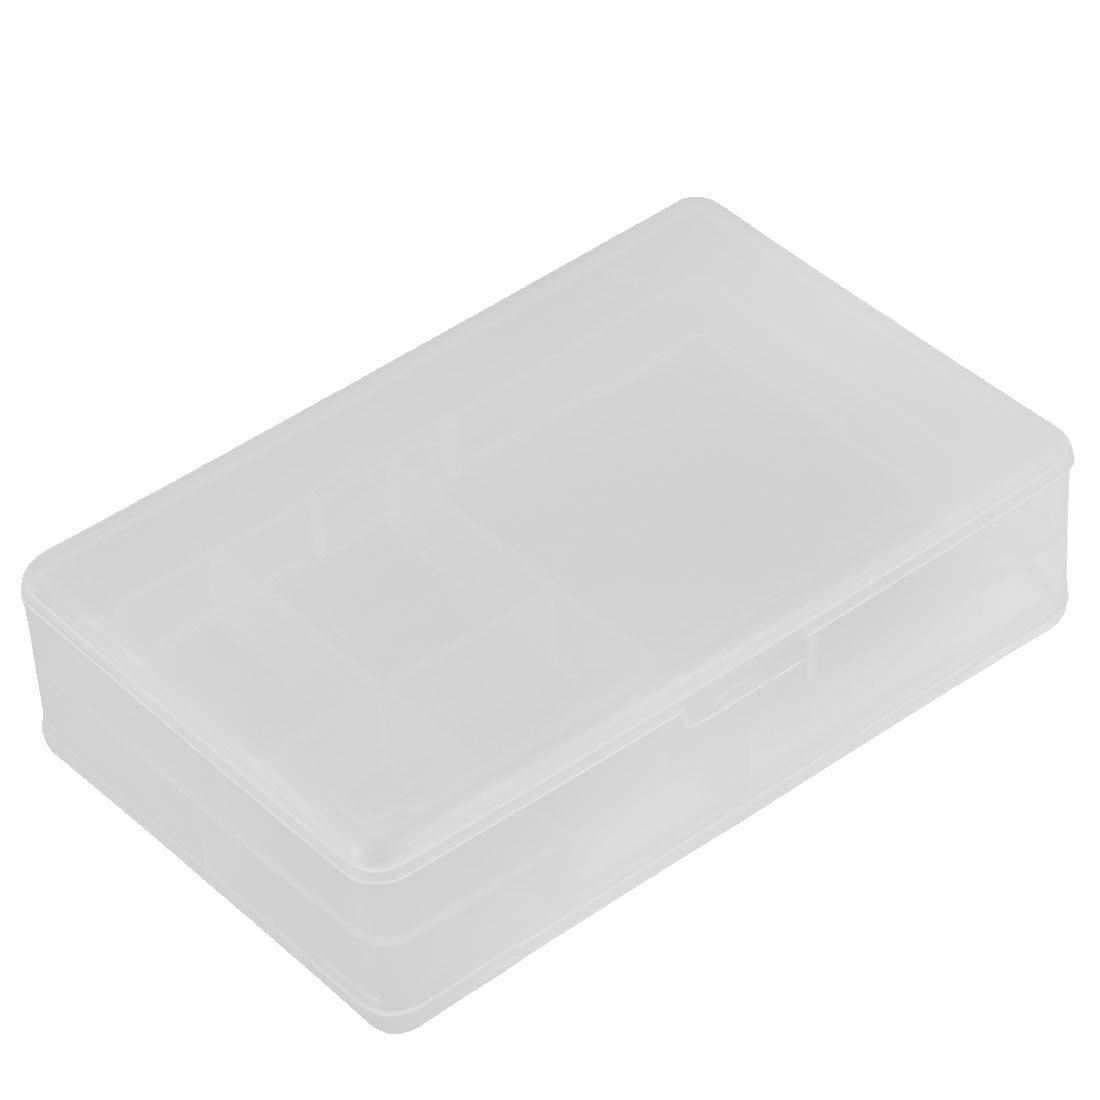 Plastic Dual Layers 5 Compartments Storage Case Box Organizer Conatiner - image 3 of 3